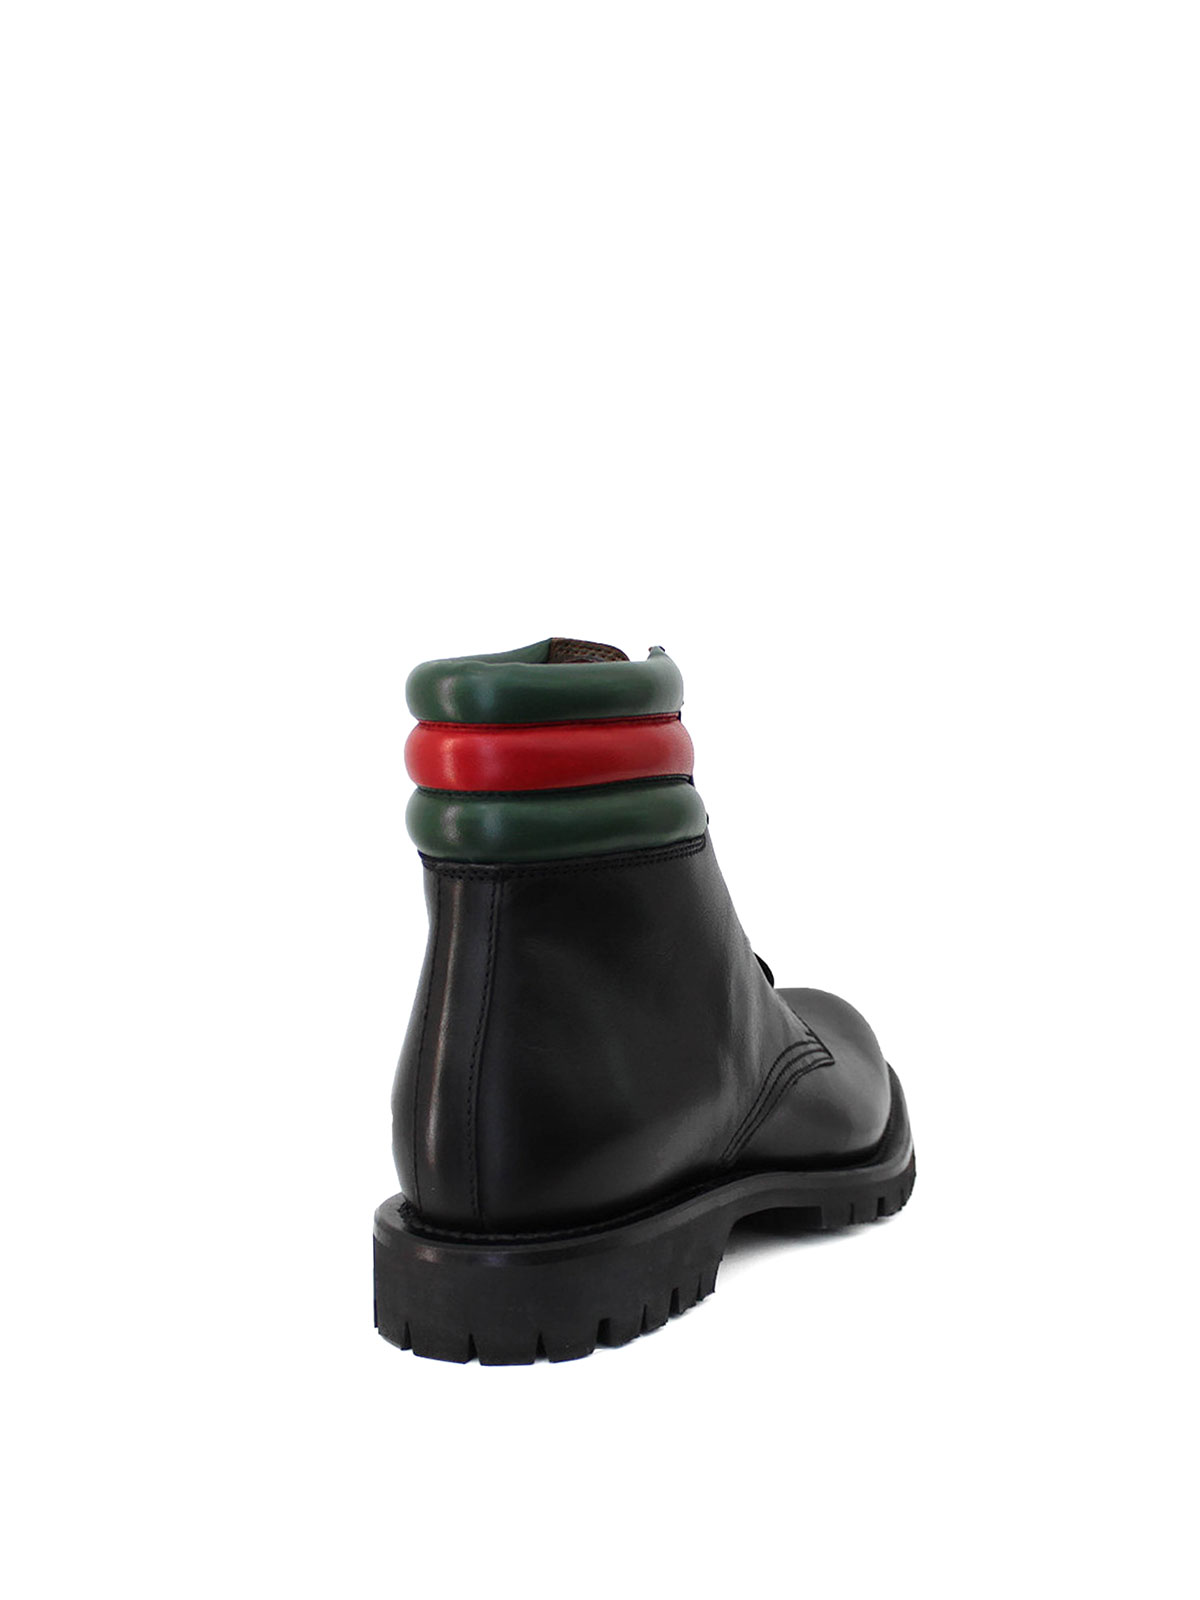 Gucci Web detail military boots 6ctw2rSo